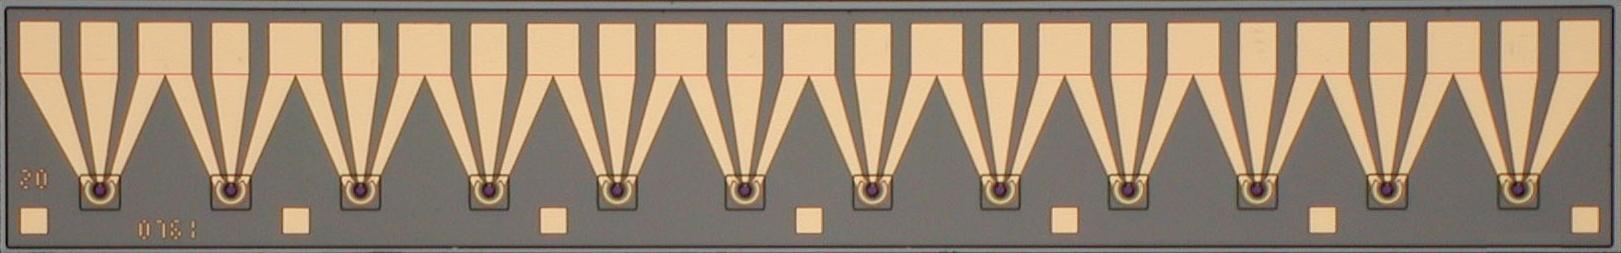 PDCA12-20